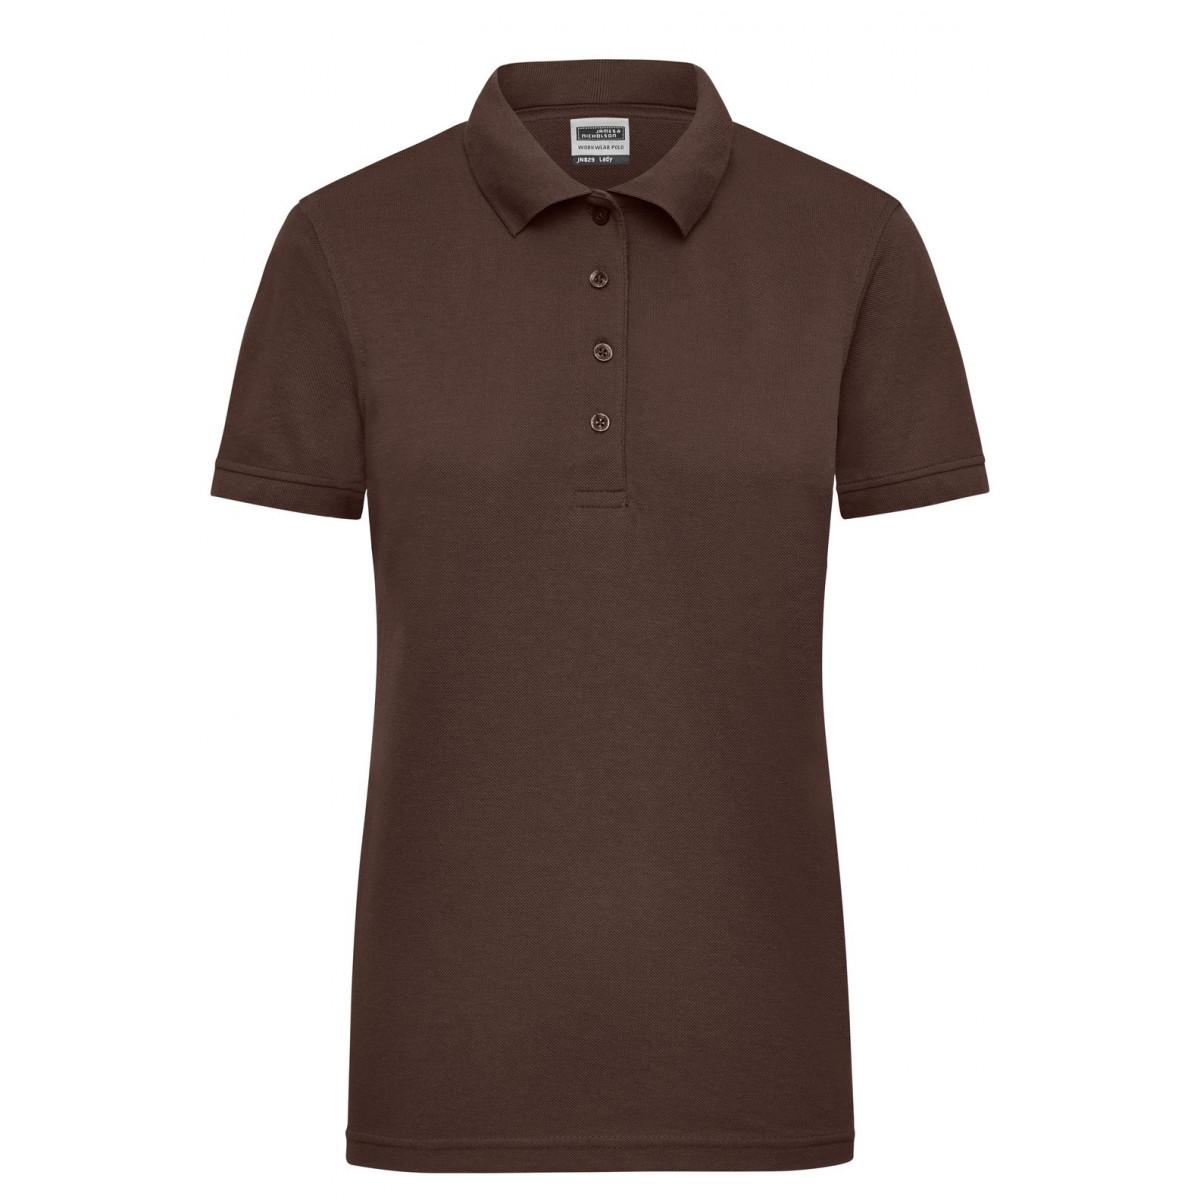 Рубашка поло женская JN829 Ladies Workwear Polo - Коричневый